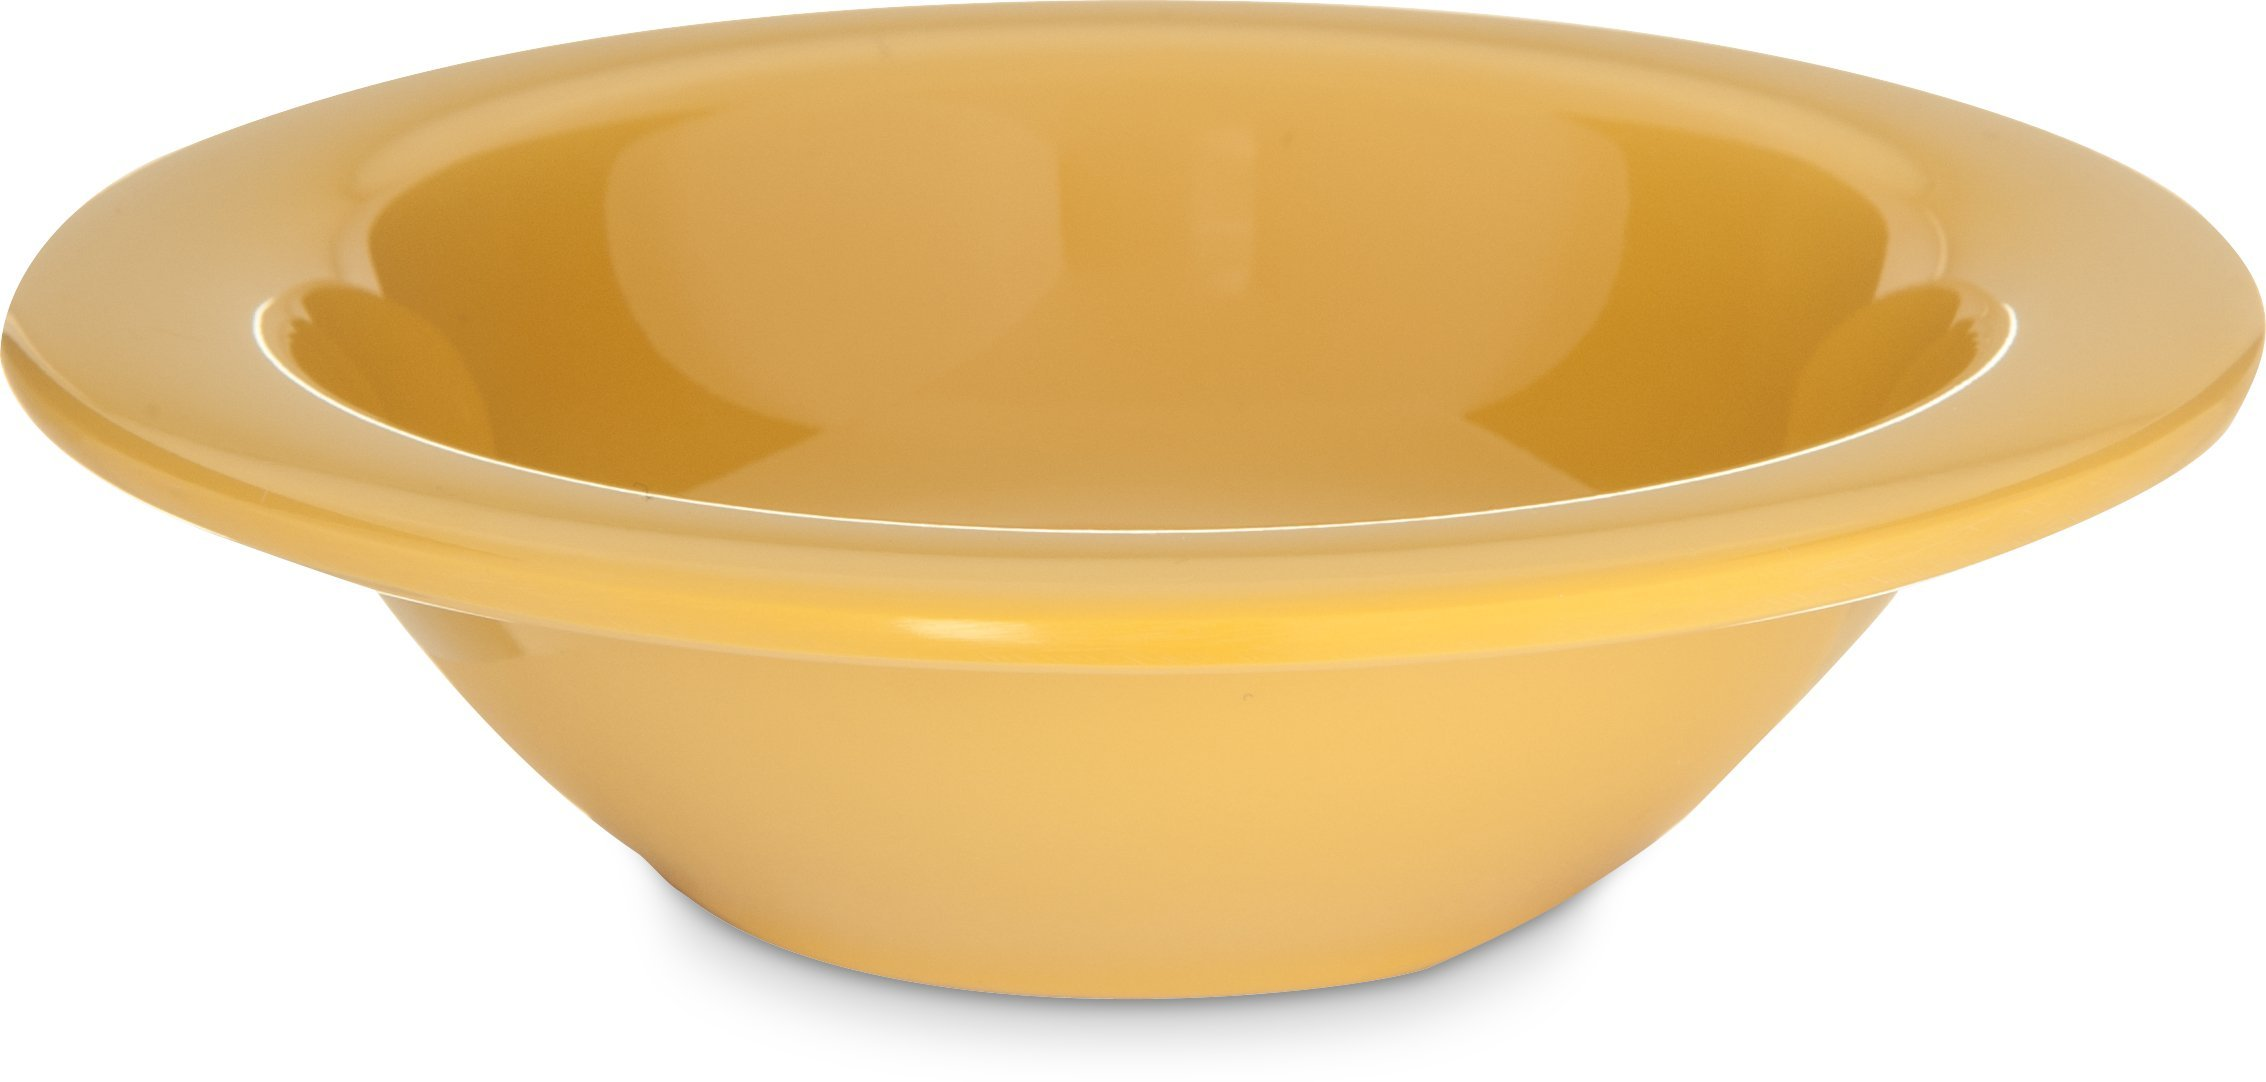 Carlisle 4304222 Durus Rimmed Melamine Fruit Bowl, 4 Oz., Honey Yellow (Pack of 48)